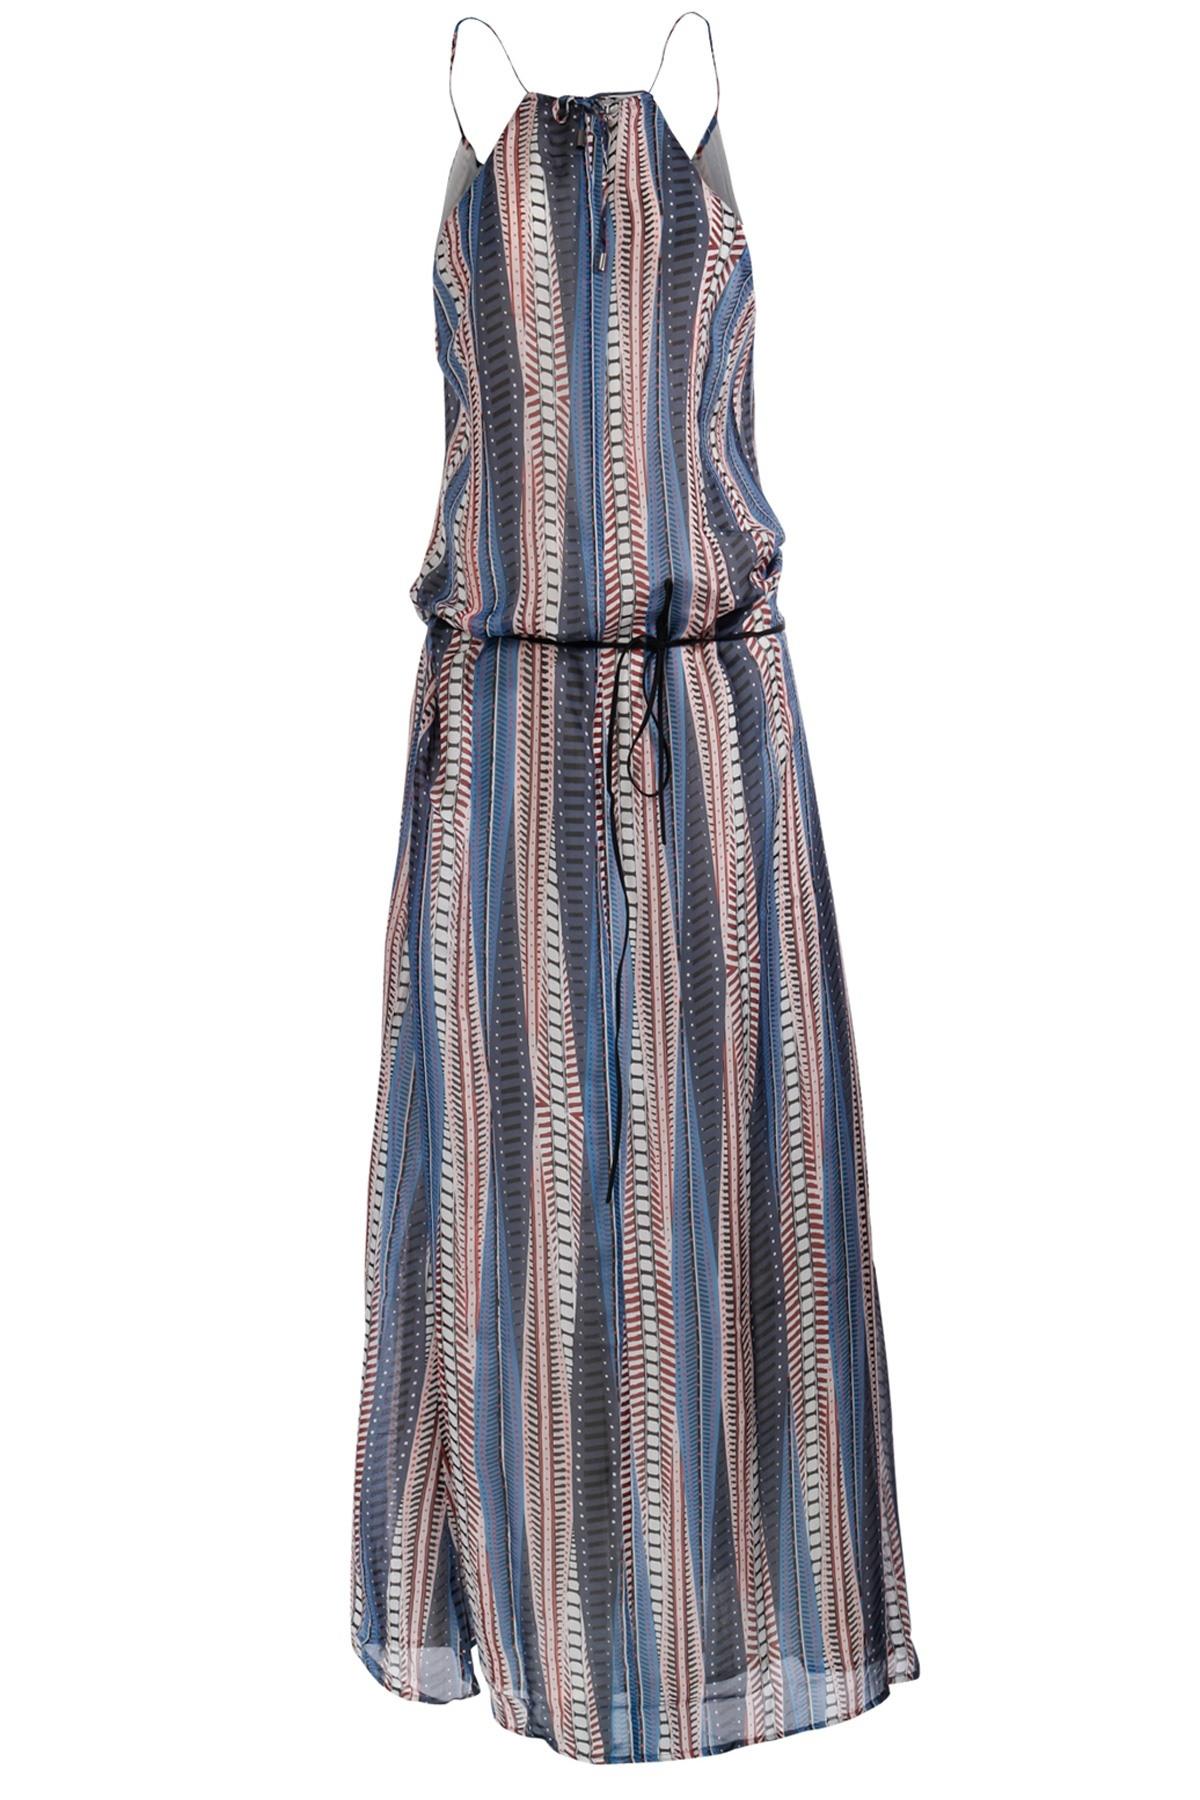 Coolste Blau Weißes Kleid SpezialgebietFormal Coolste Blau Weißes Kleid Galerie